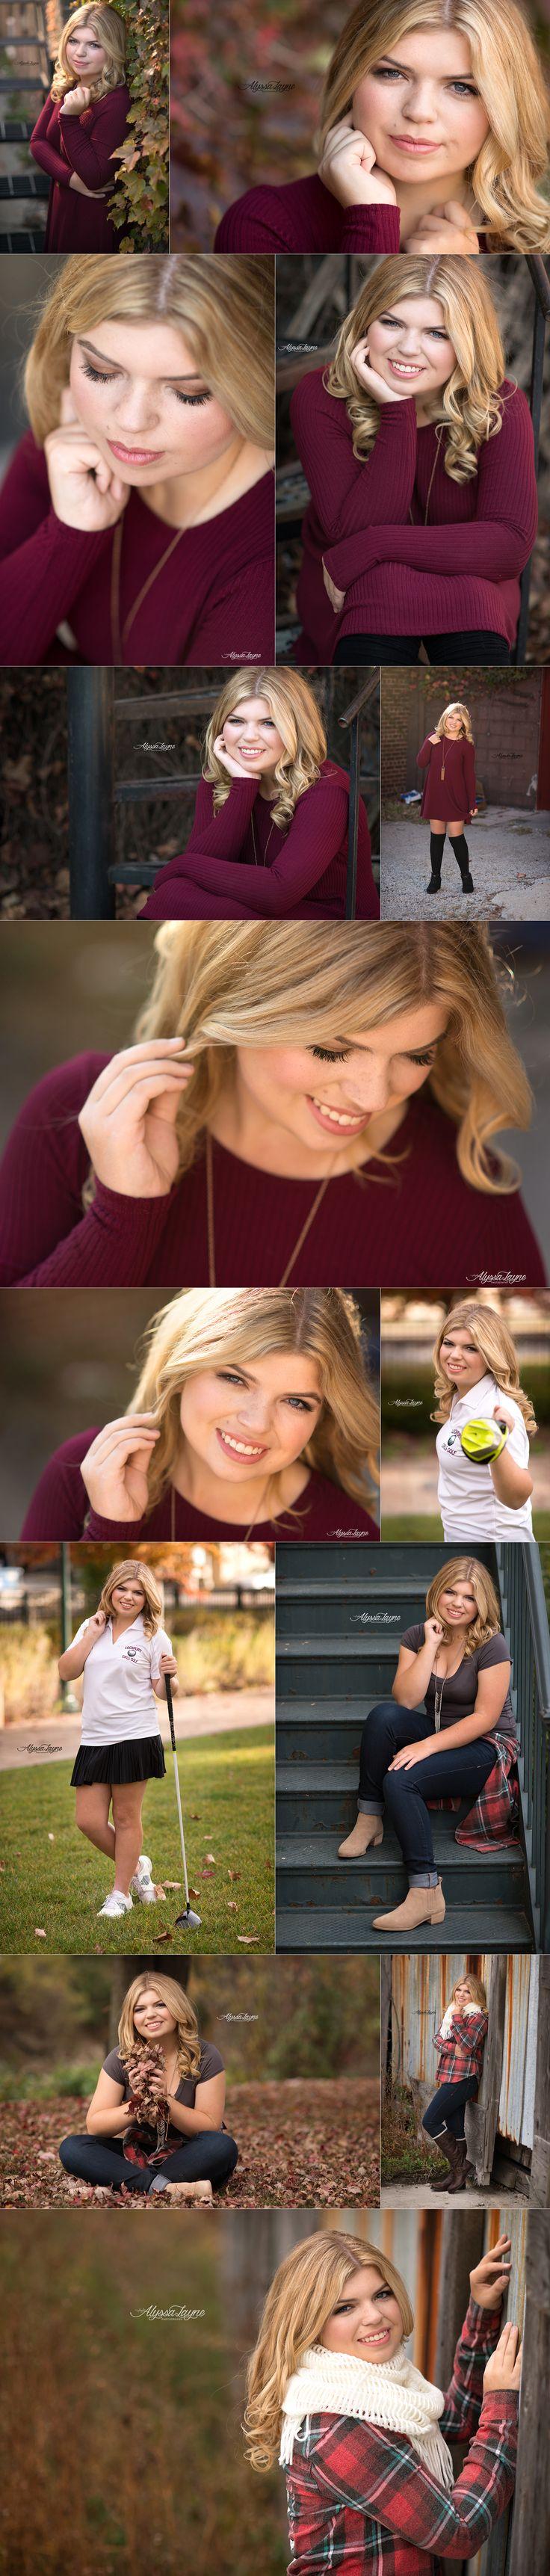 Alyssa Layne Photography | Senior Pictures | Madi | Senior poses | Illinois Senior Photographer | Posing | Light | Backlit | Highschool Senior Photographer| Class of 2016 | Posing ideas